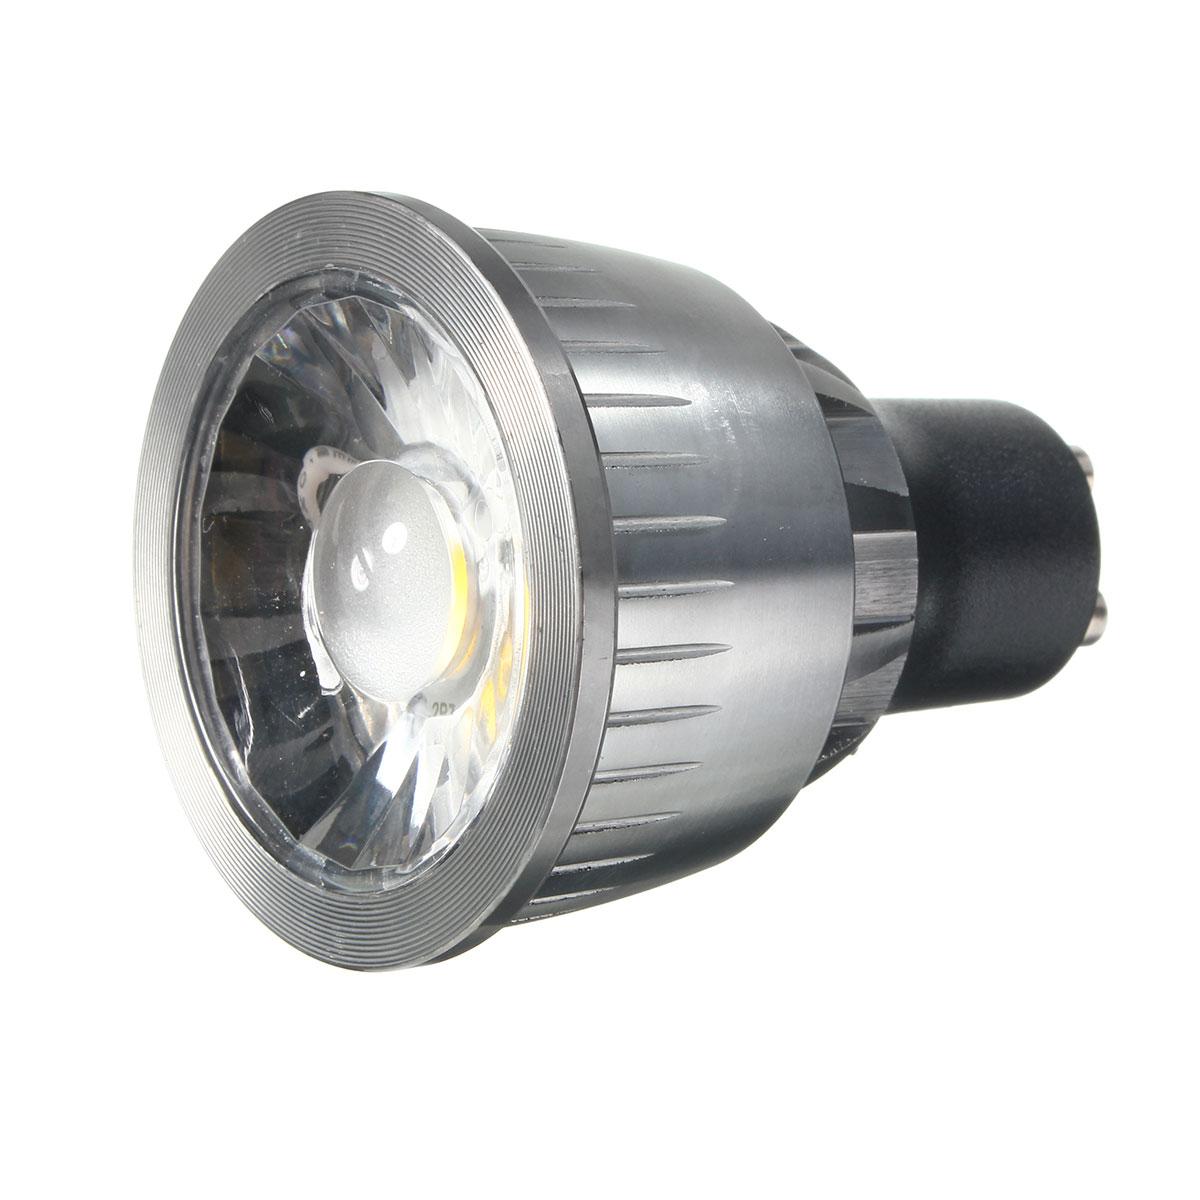 gu10 3w ultra bright led cob pure white warm white spot lighting bulb ac85 265v. Black Bedroom Furniture Sets. Home Design Ideas